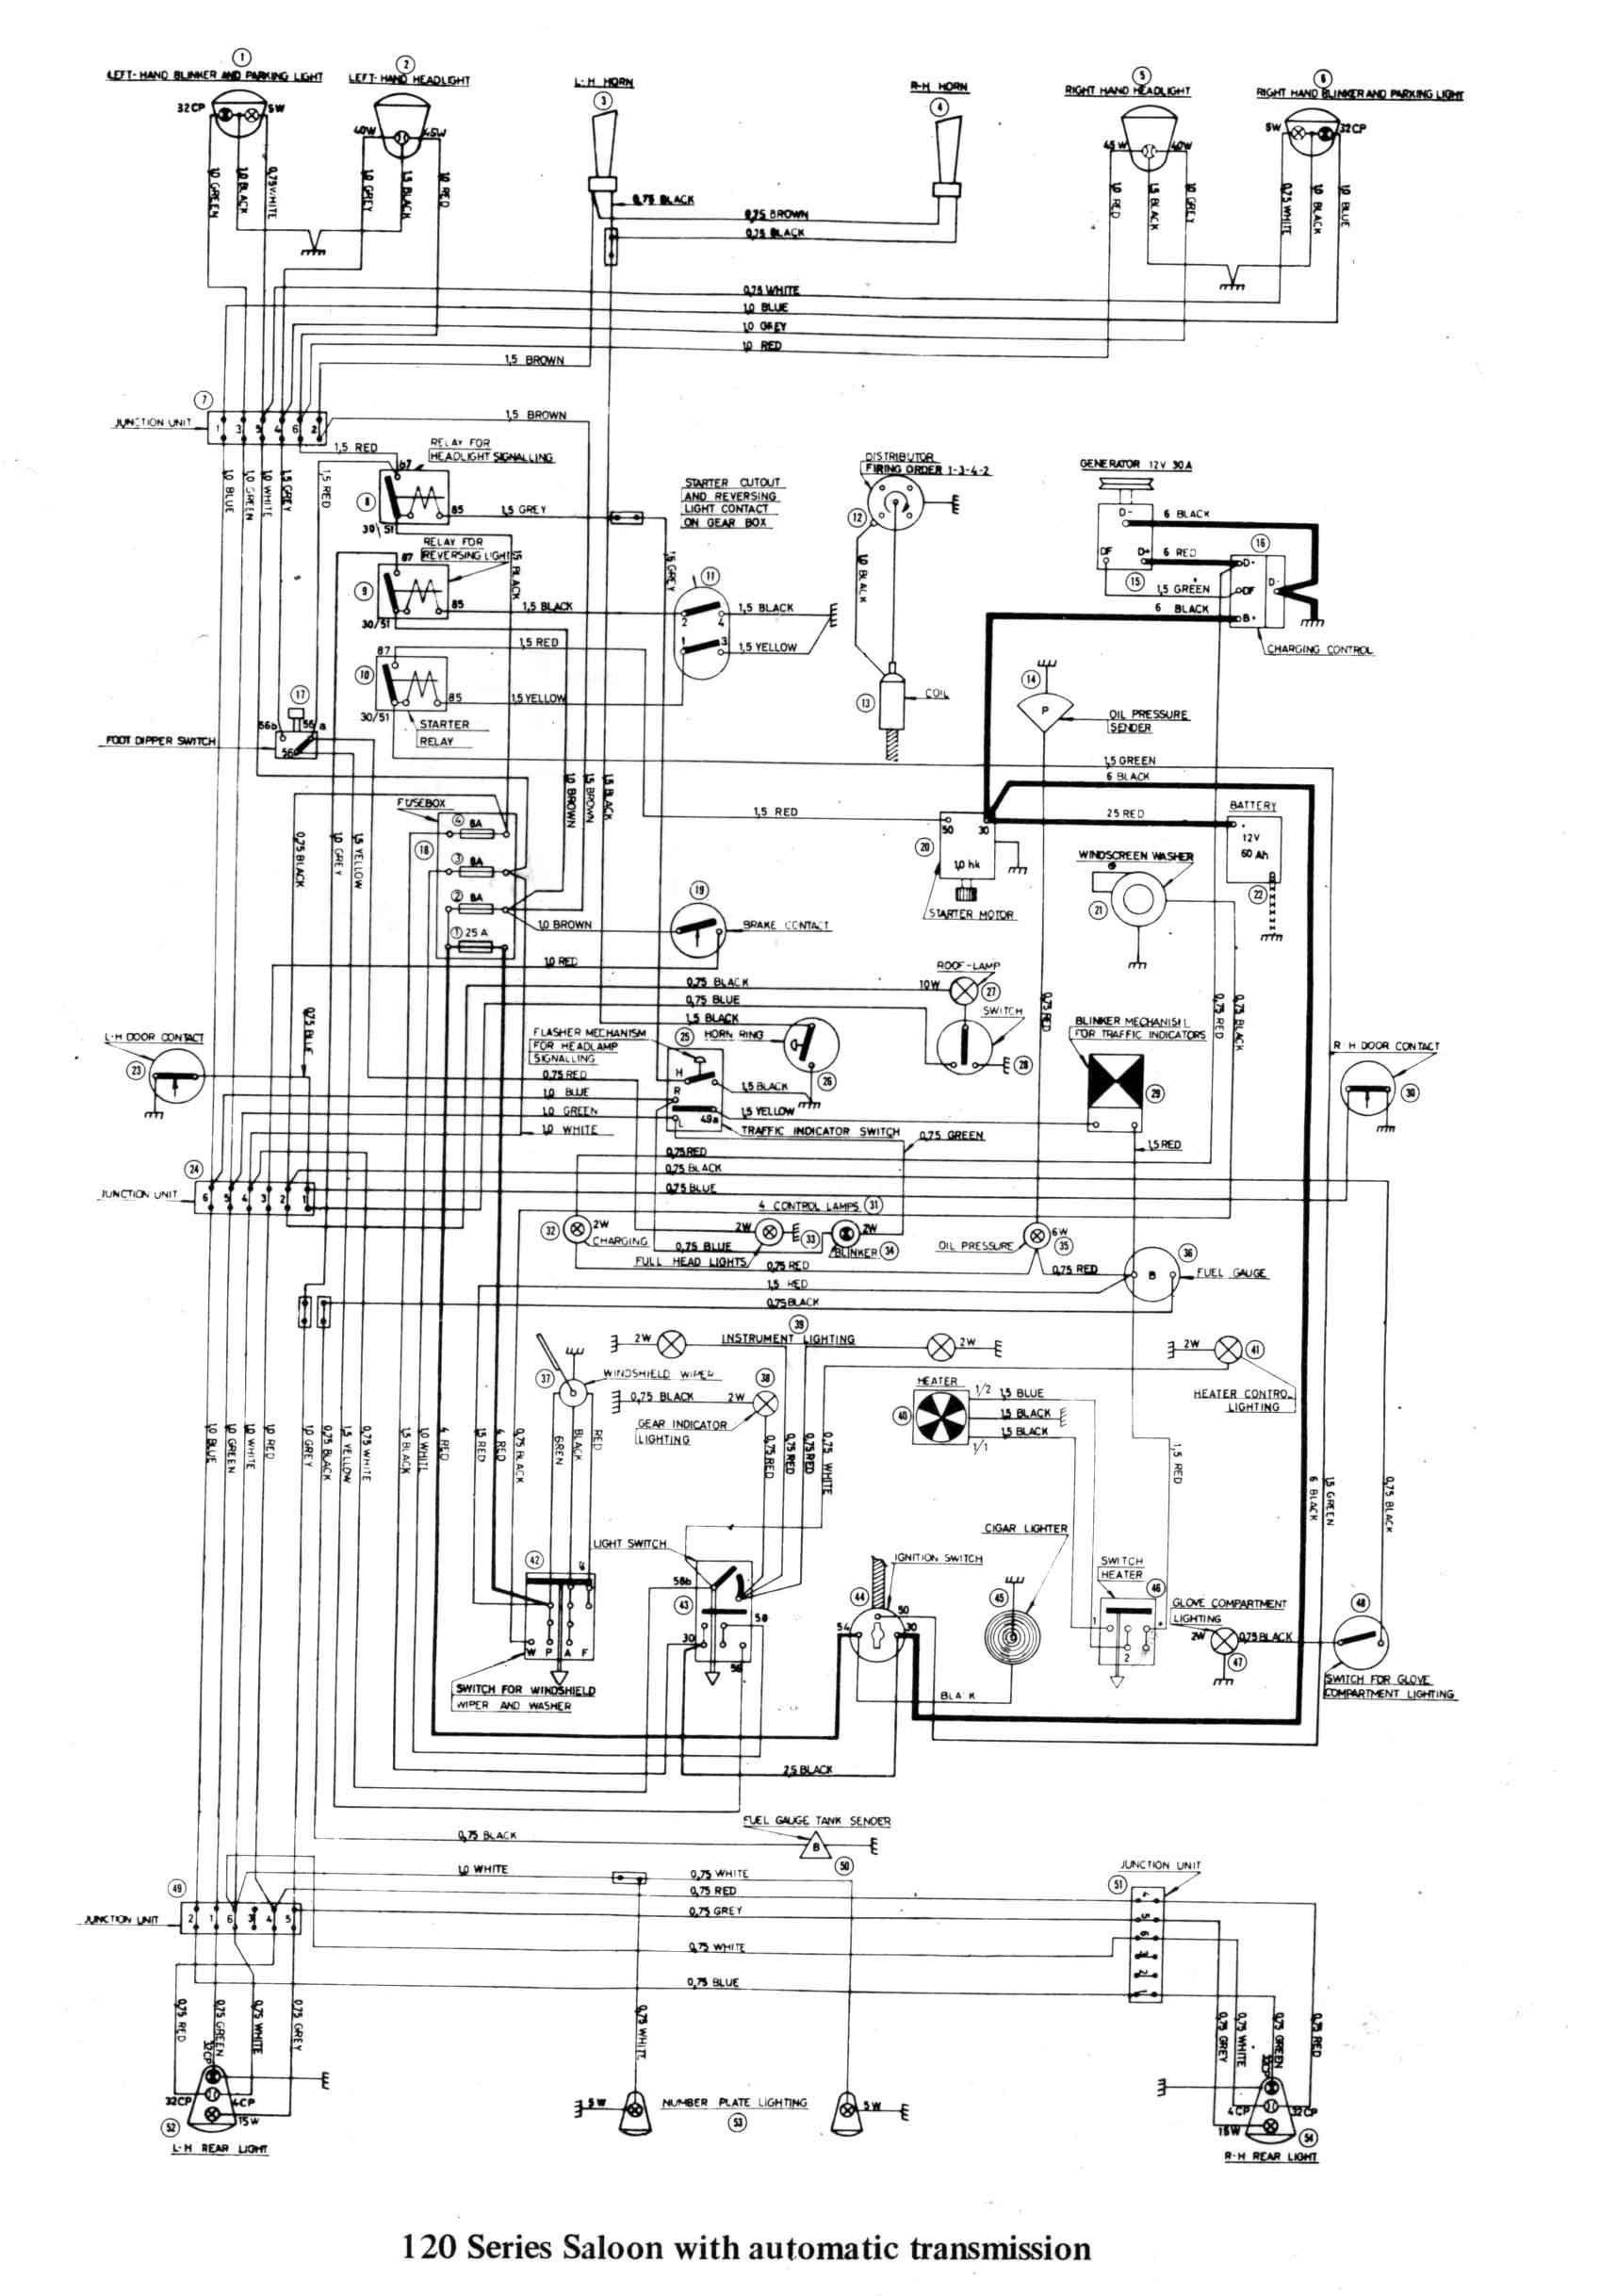 Ezgo Golf Cart Parts Diagram Wiring Diagram 48v Golf Cart Valid Wiring Diagram for Ezgo Electric Of Ezgo Golf Cart Parts Diagram